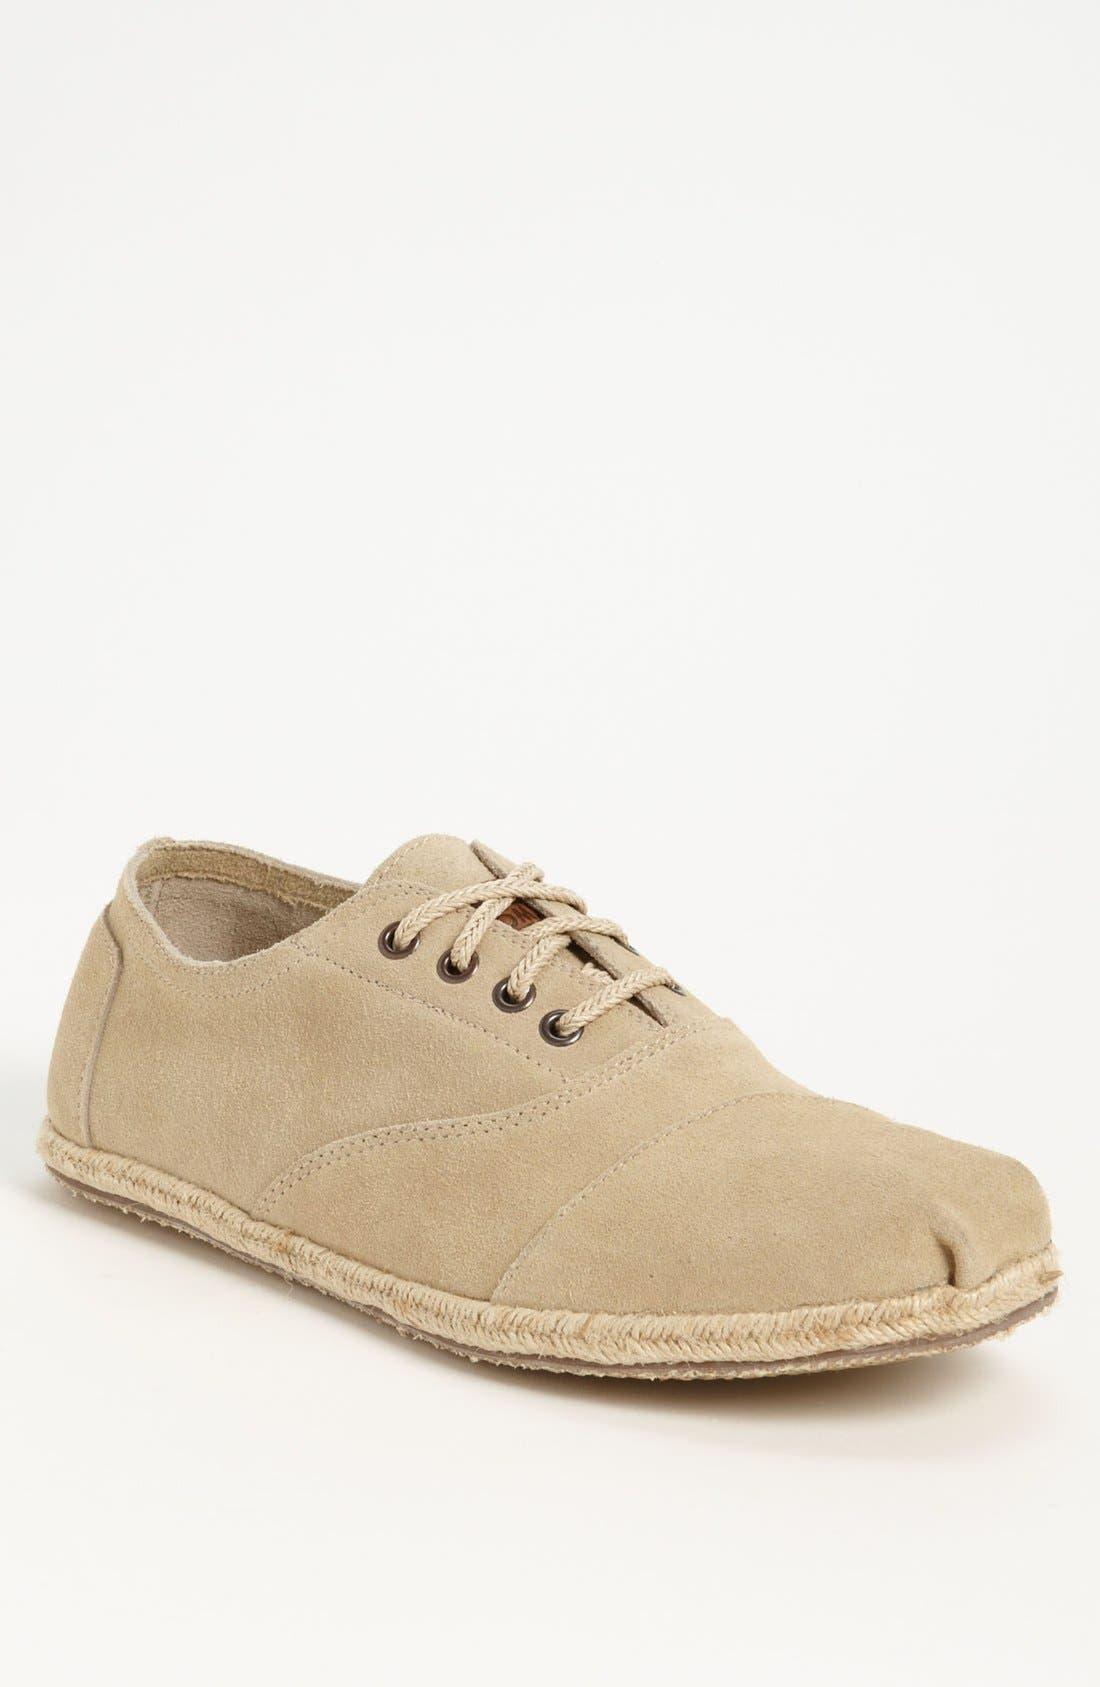 Alternate Image 1 Selected - TOMS 'Cordones' Suede Sneaker (Men)